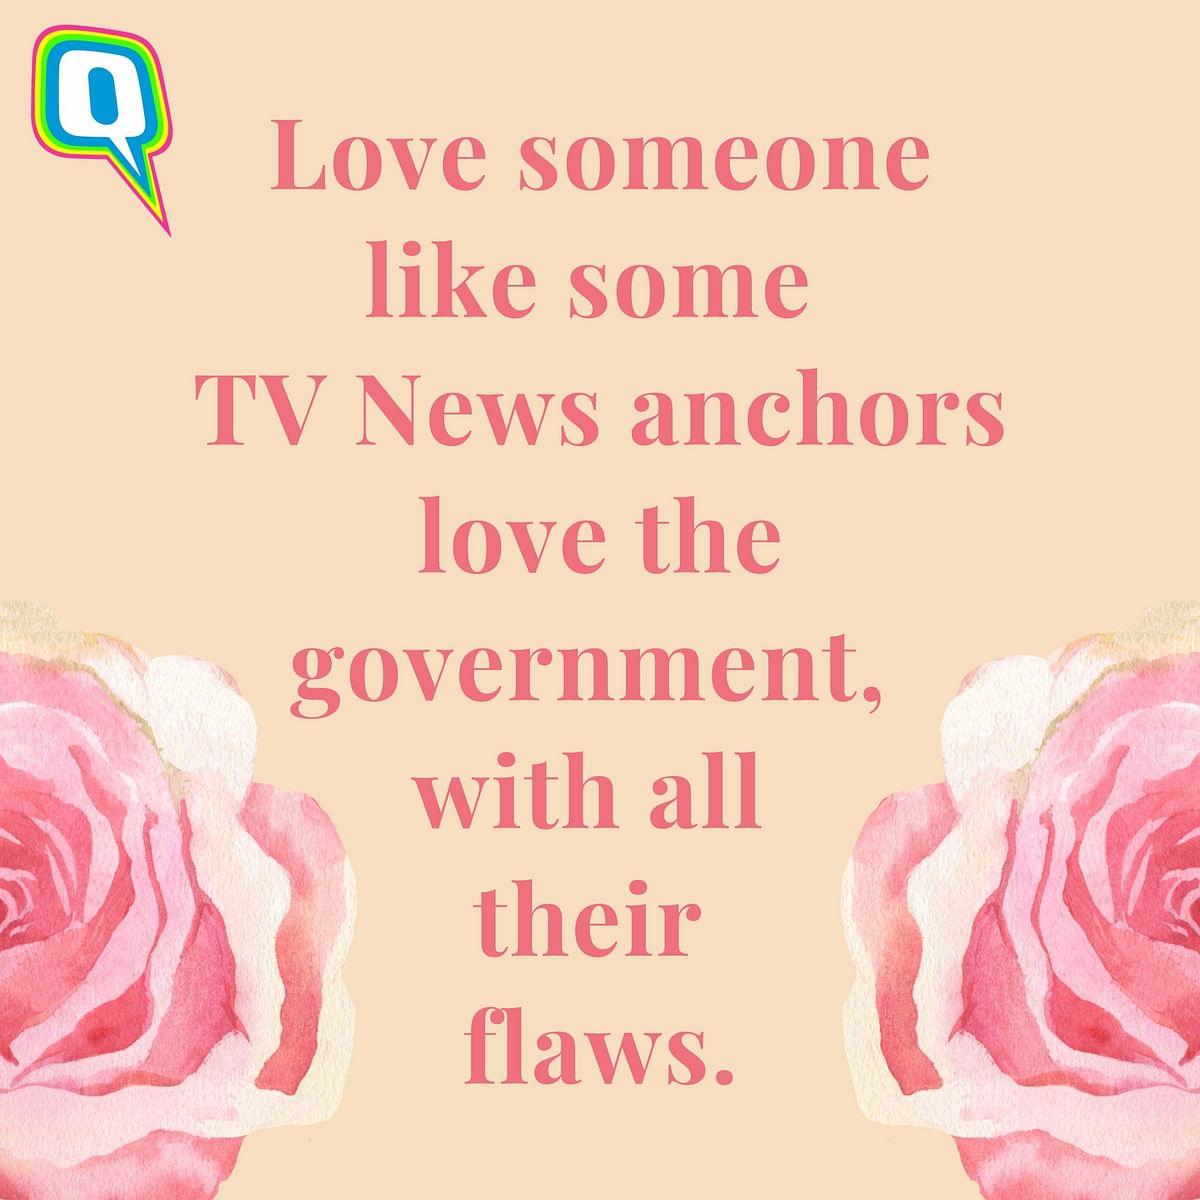 "<div class=""paragraphs""><p>Fall in love with their flaws.&nbsp;</p></div>"